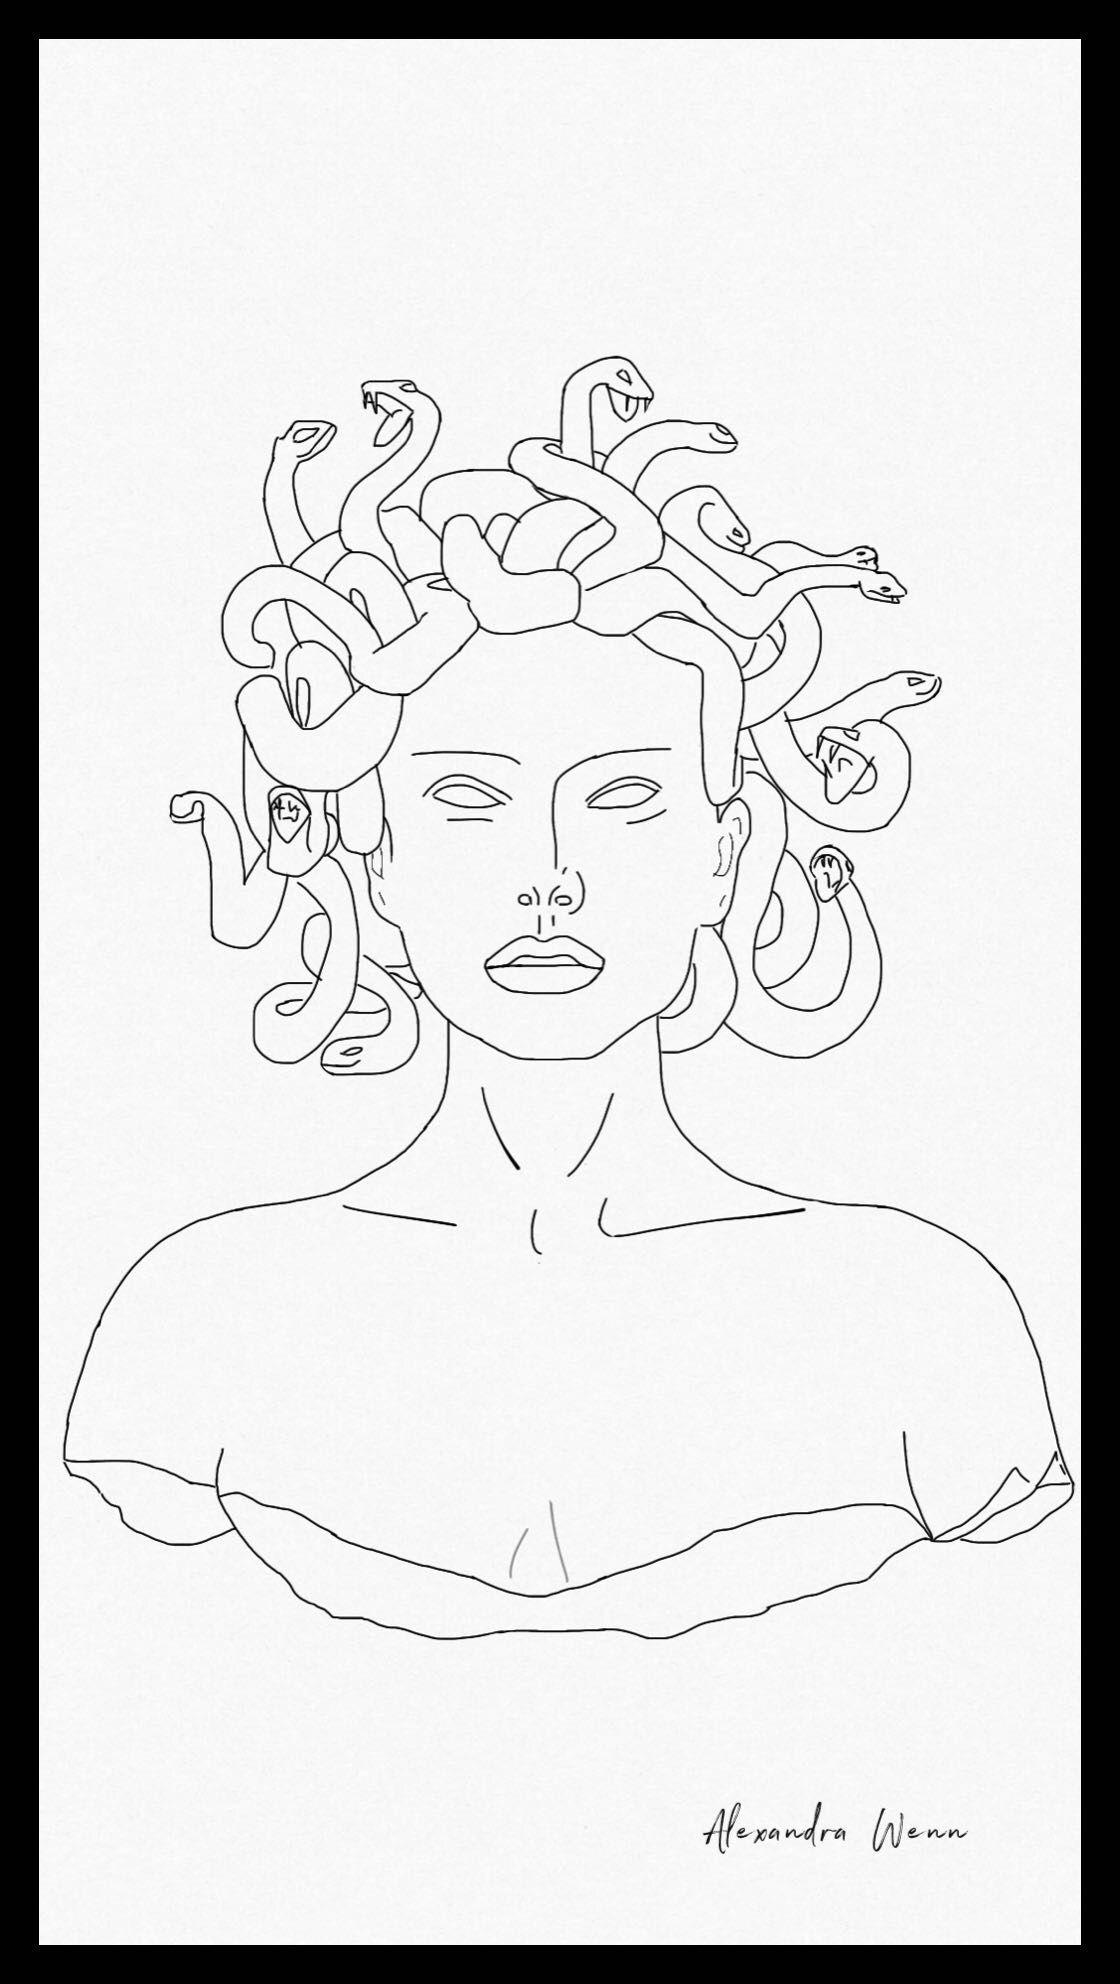 En La Mitología Griega La Cabeza De Medusa Era Un Gorgoneion Un Amuleto Apotropaico Que Inducia Horror Al Most Desenho Hippie Arte Engraçada Desenho Da Medusa